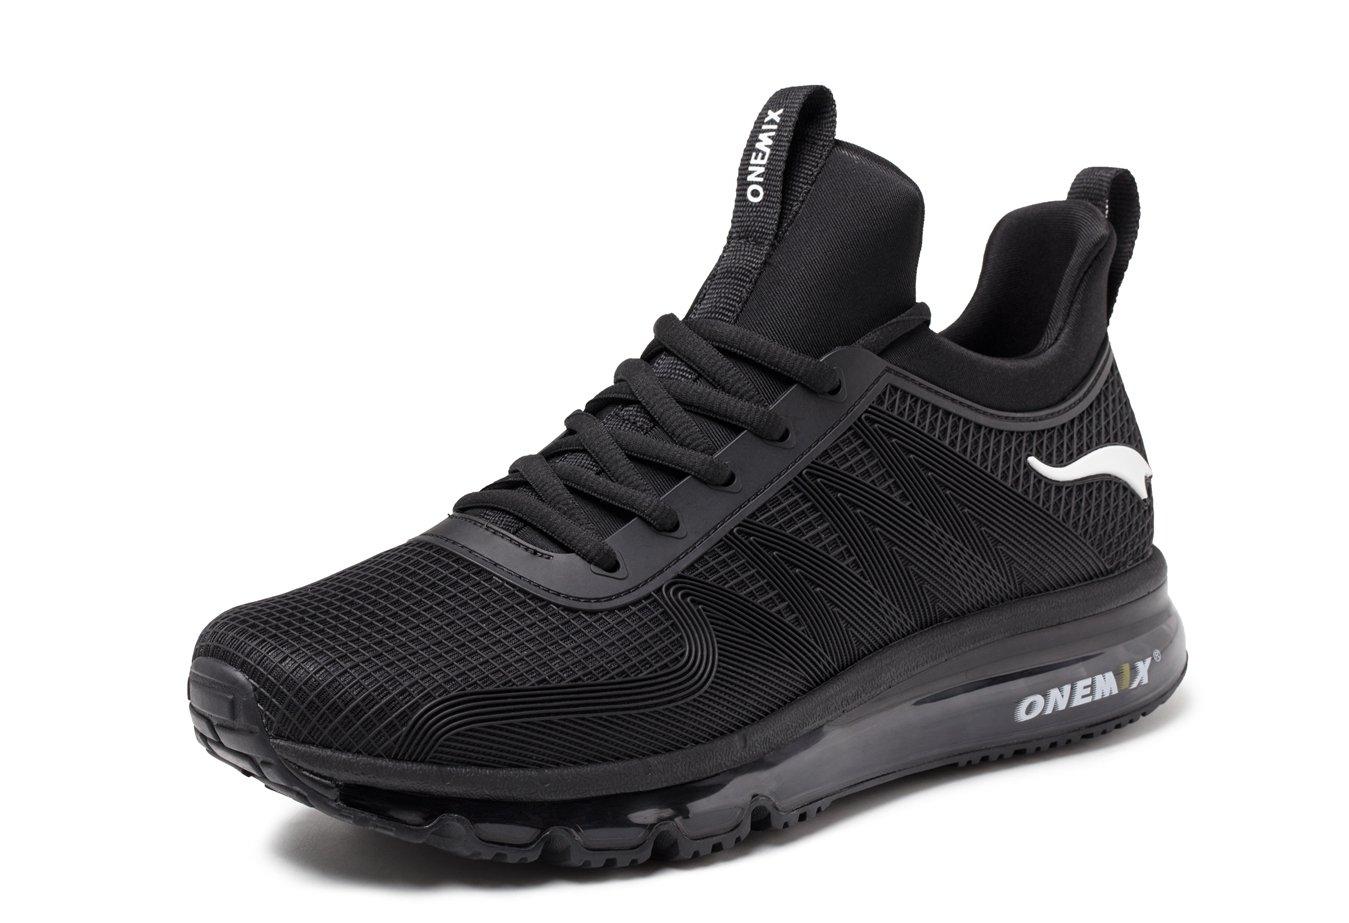 ONEMIX Hombre Zapatillas de Running Fitness Casual zapatilla de deporte 44 EU|Negro